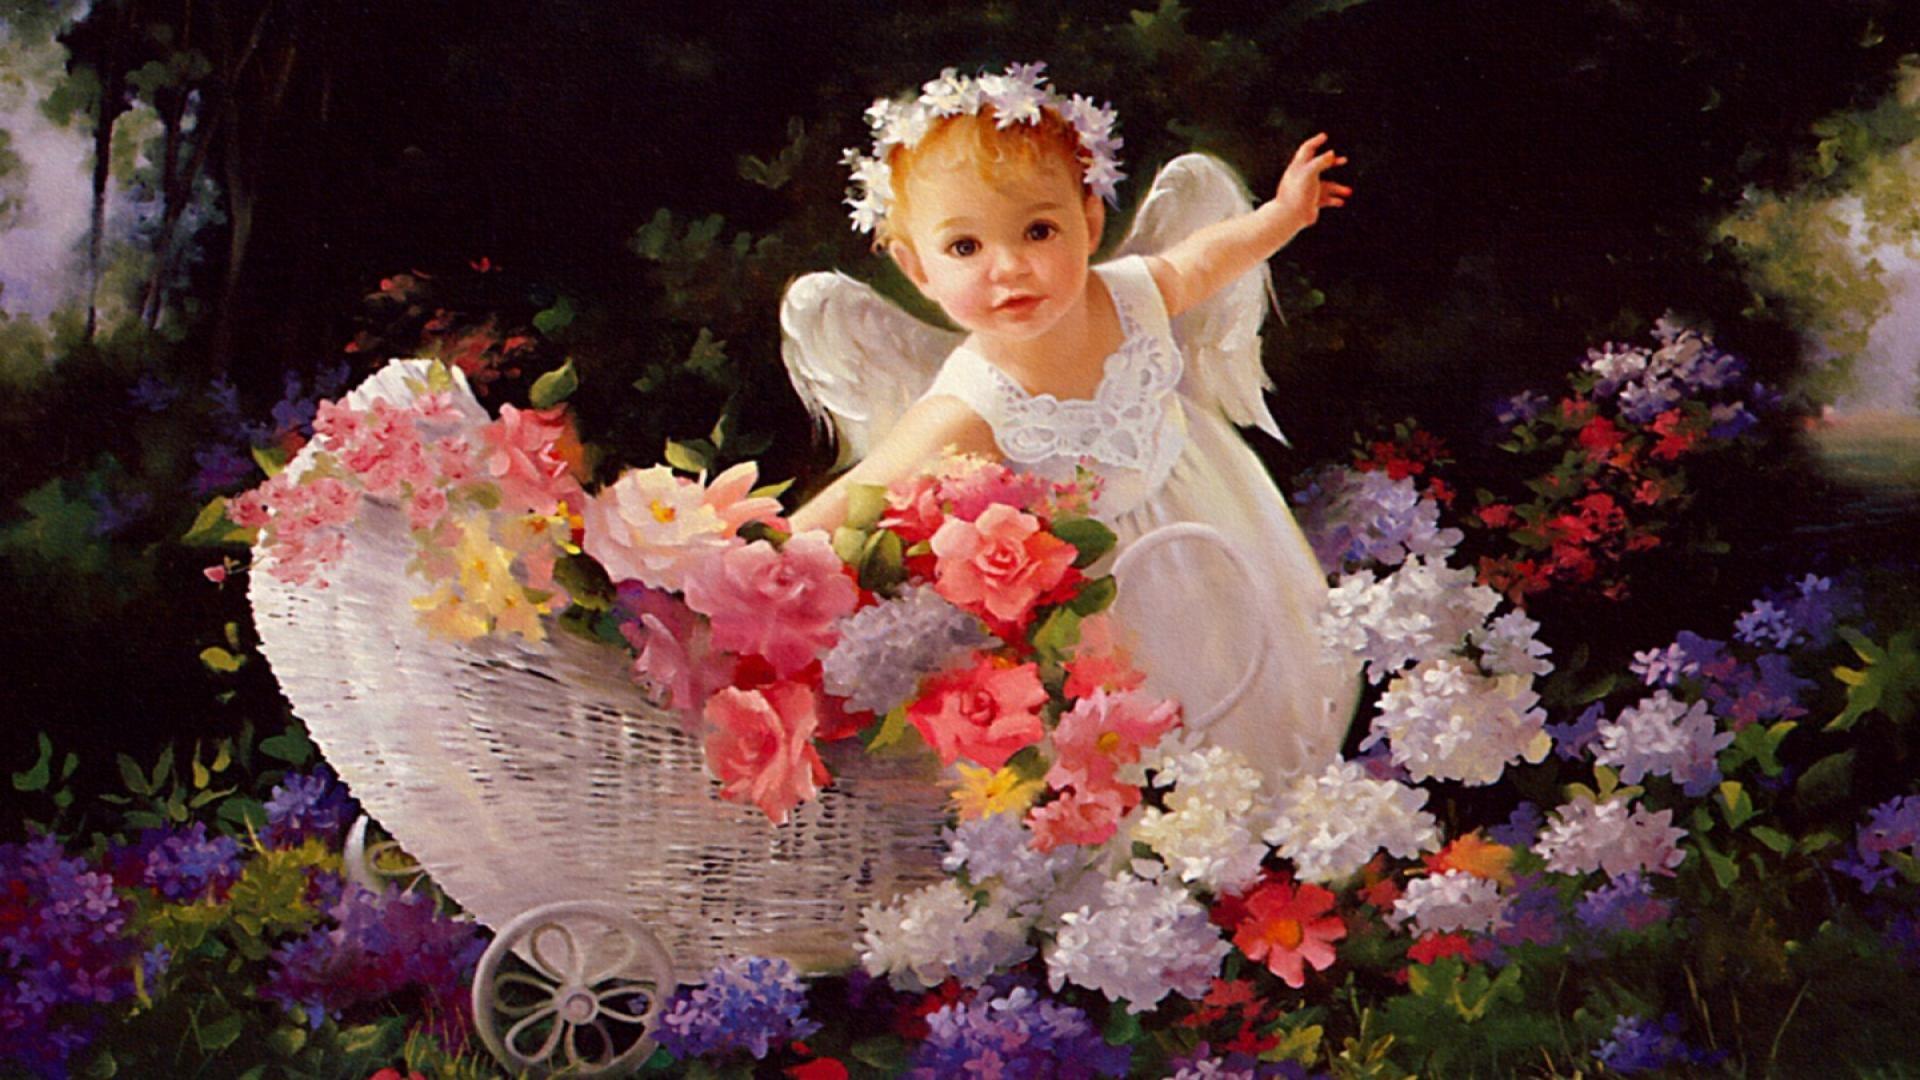 baby angels in heaven poems Google Search Cross